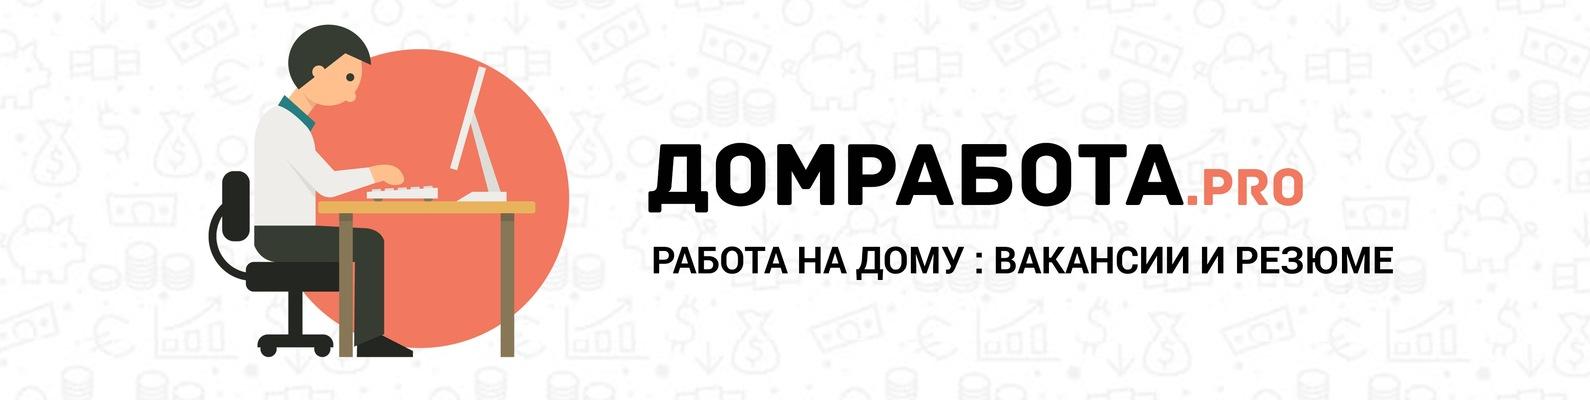 Удаленная работа на дому в москве вакансии от прямых работодателей в москве фрилансер ресторан